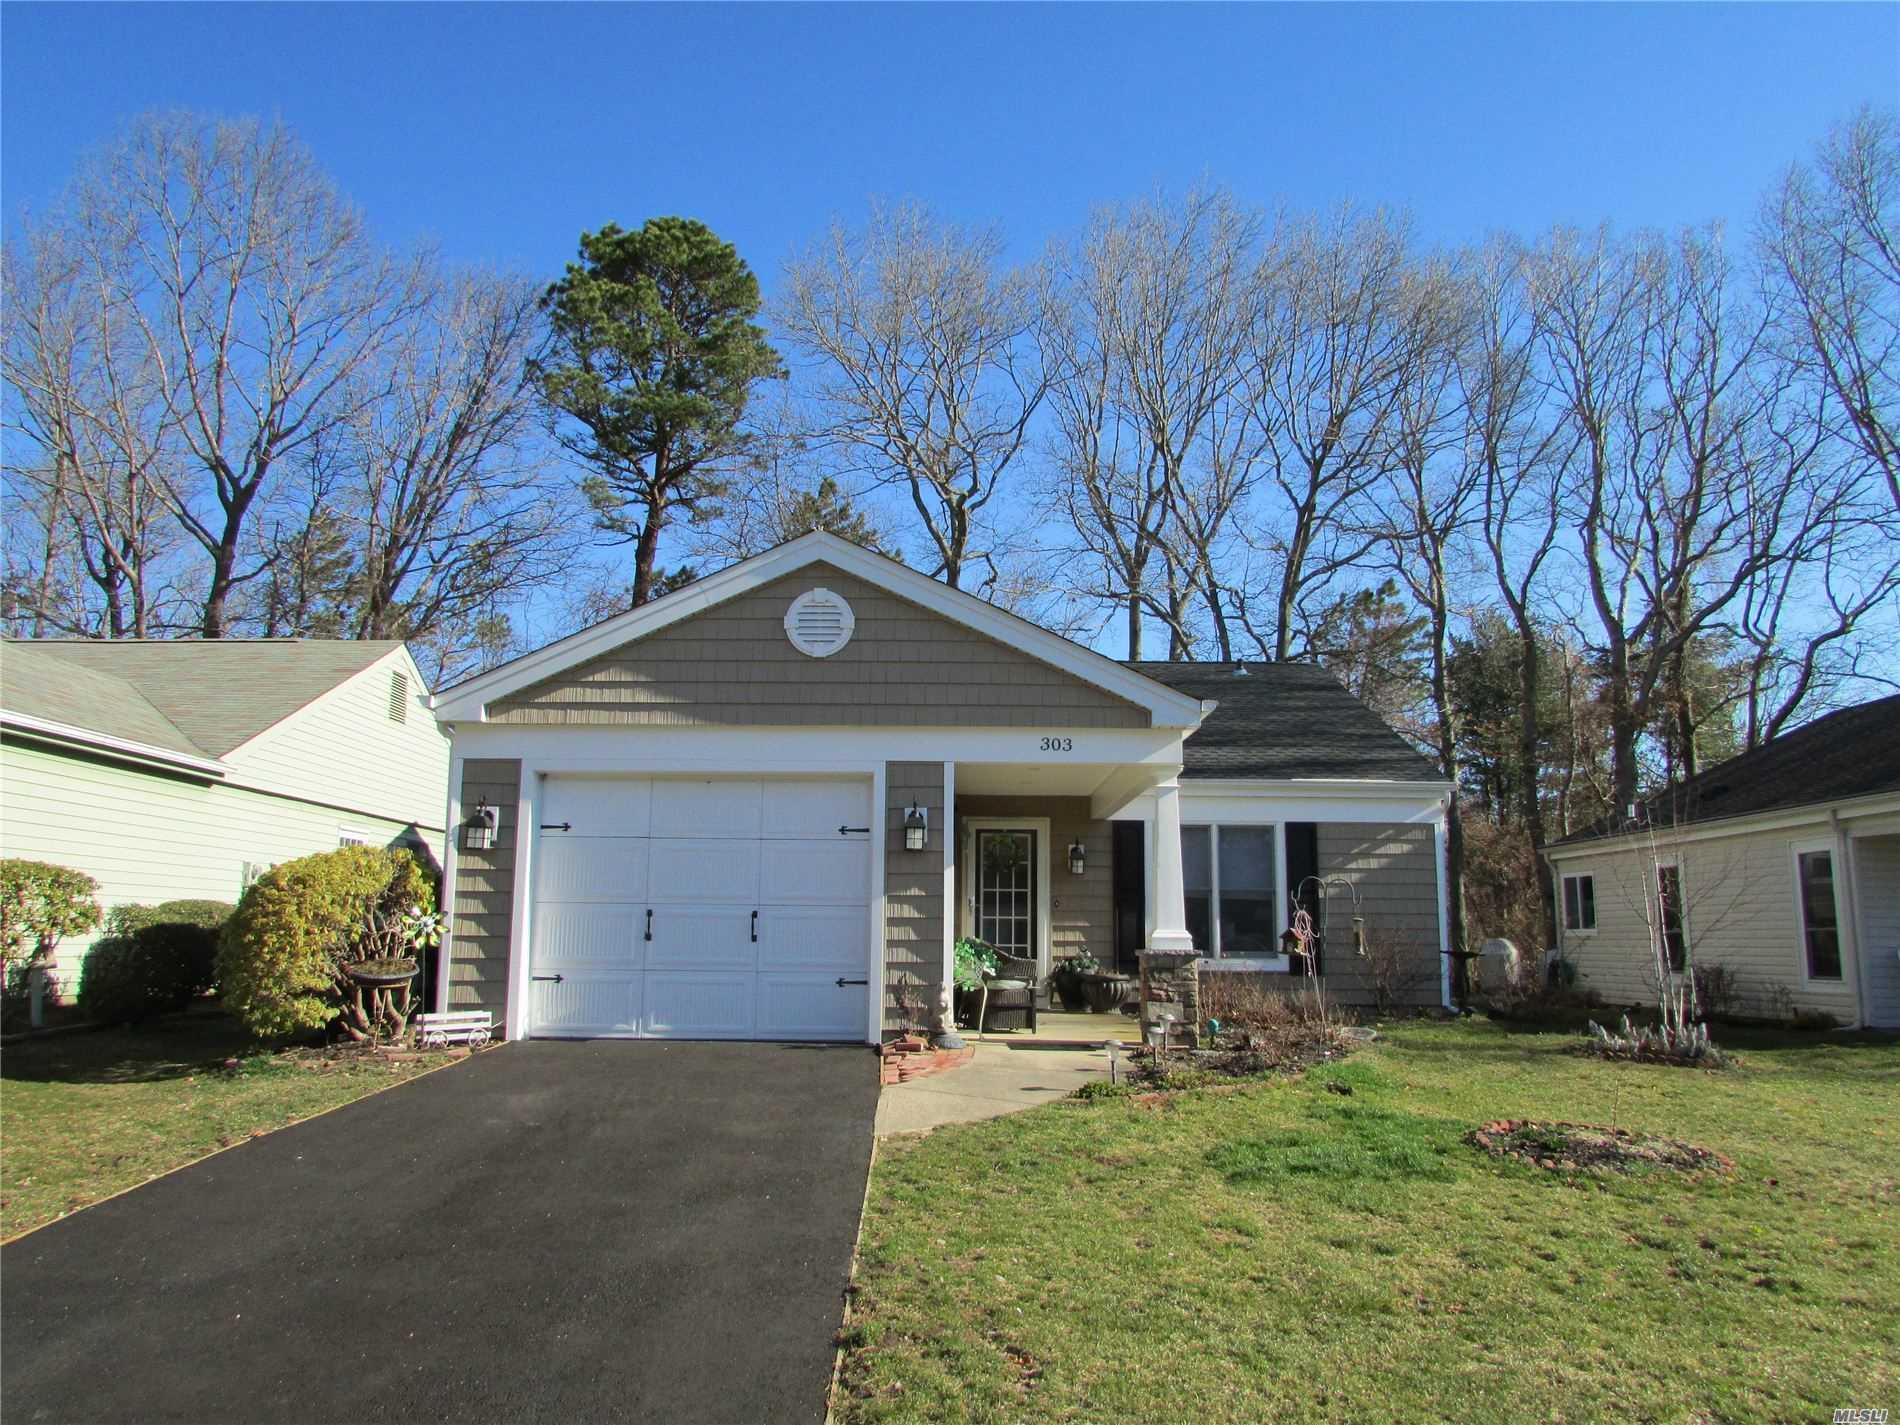 Property for sale at 303 Kingston Court, Ridge NY 11961, Ridge,  New York 11961